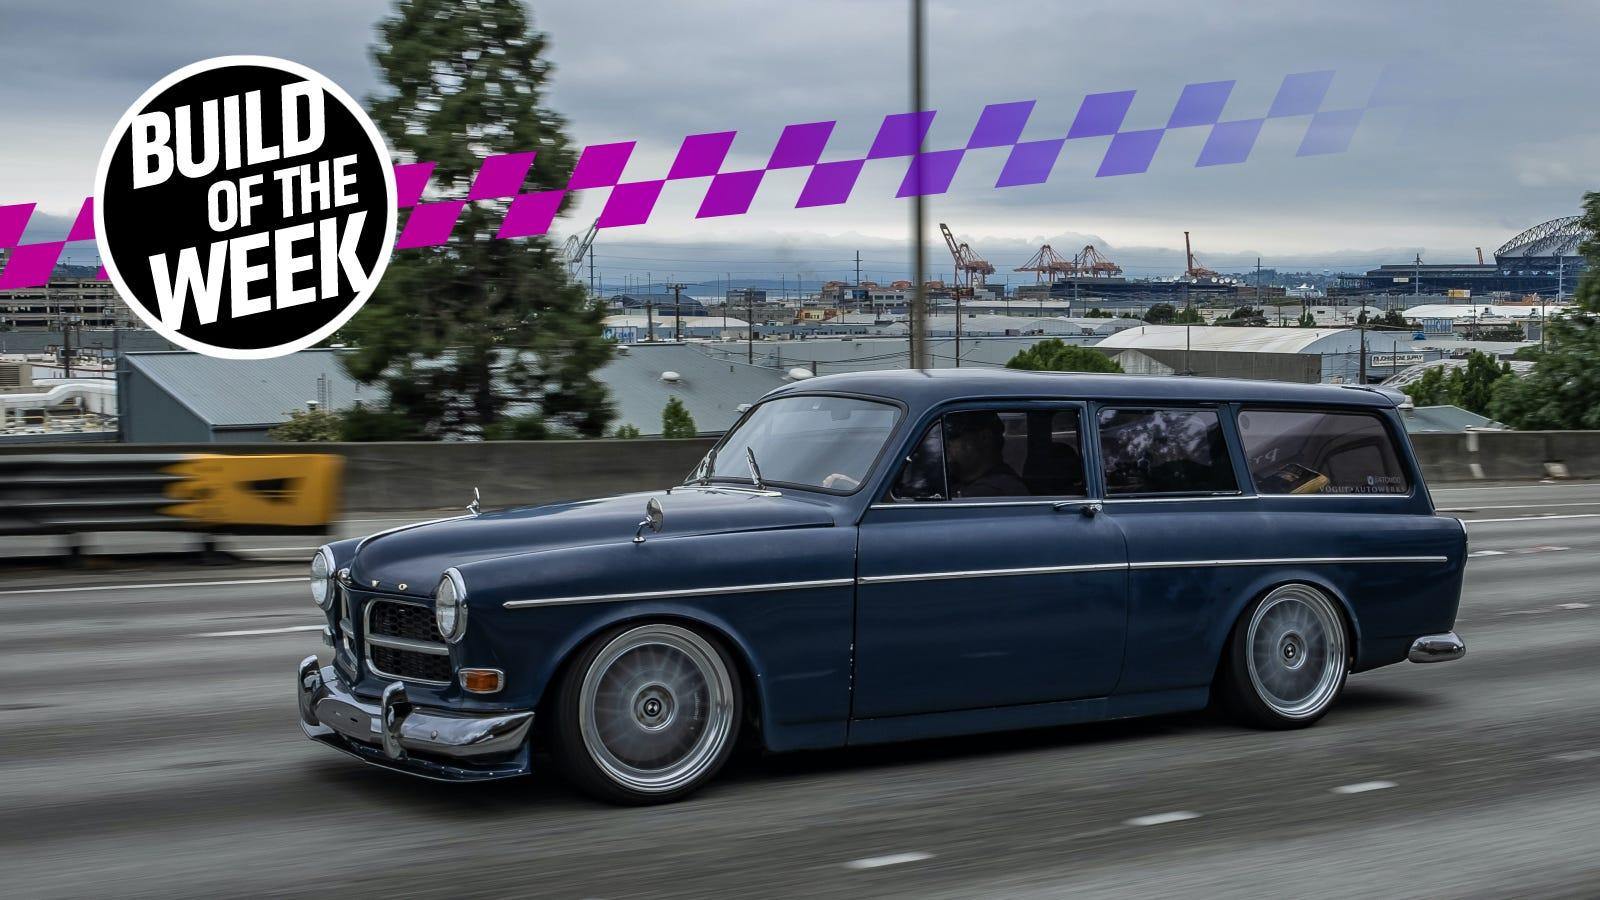 True Hero Swapped A Volvo Amazon Wagon Body Onto A BMW E30 In His Driveway